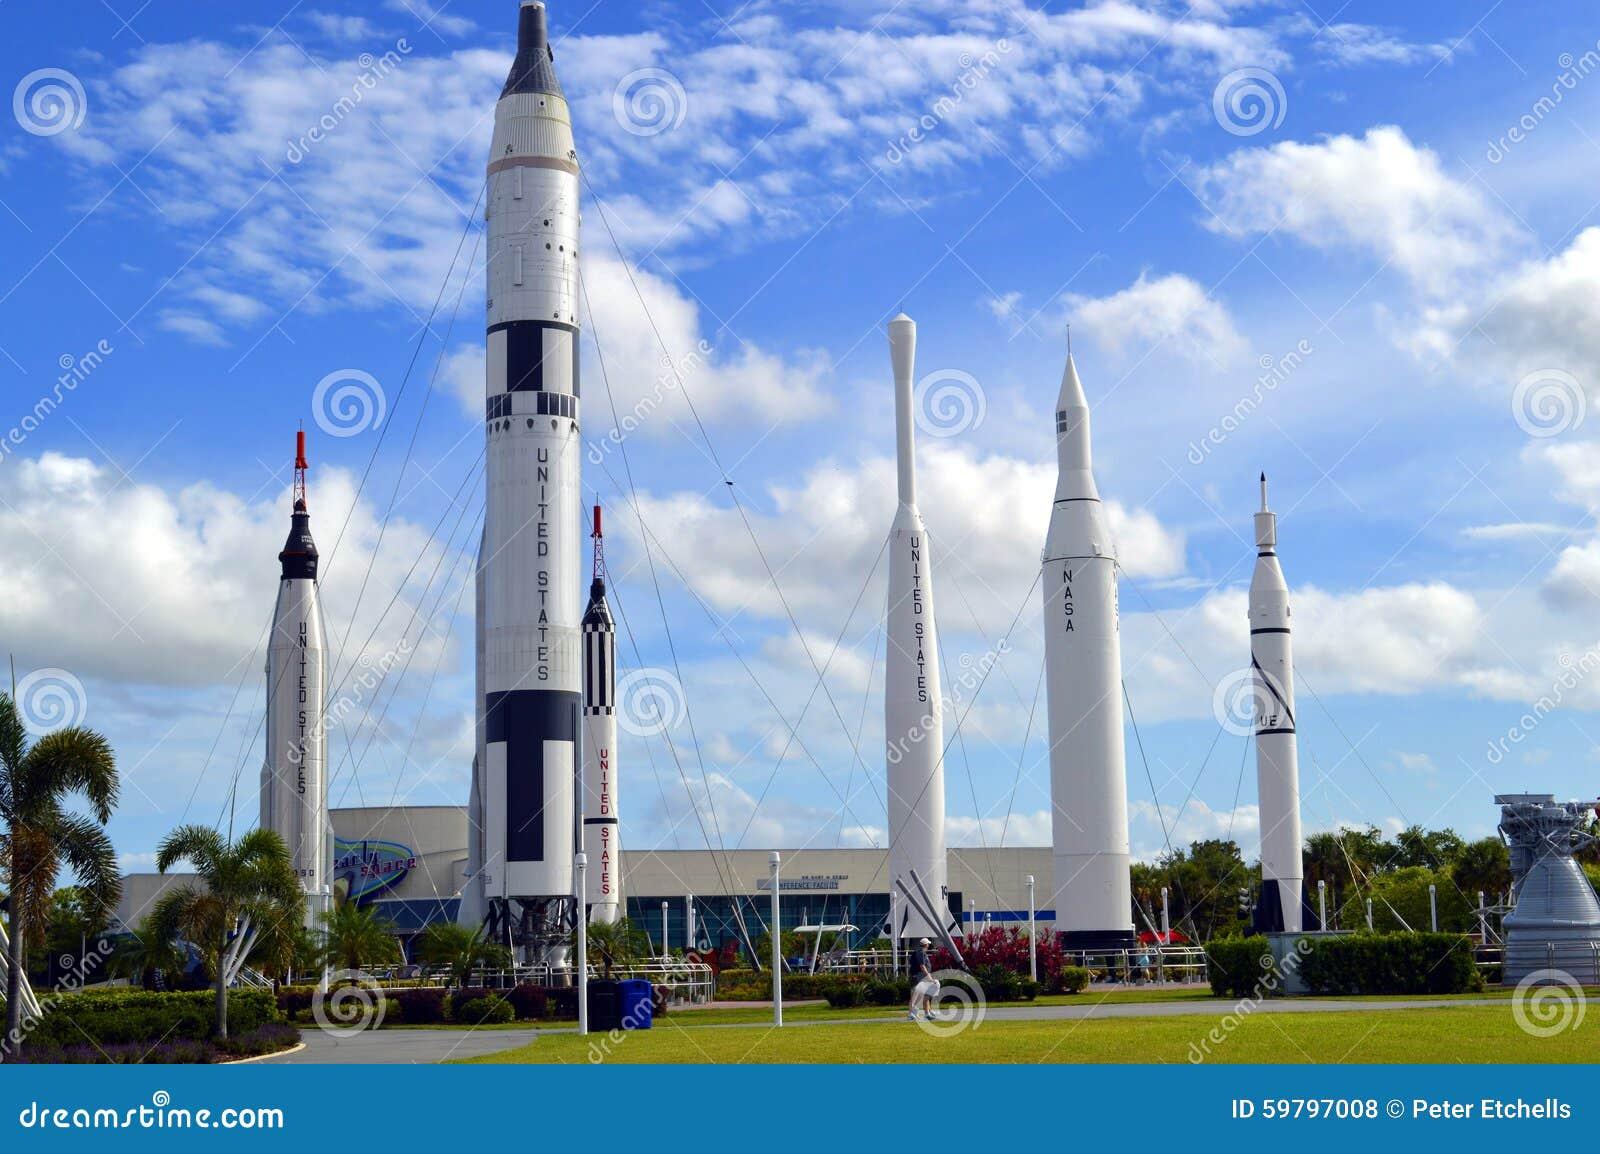 apollo 13 kennedy space center - photo #35